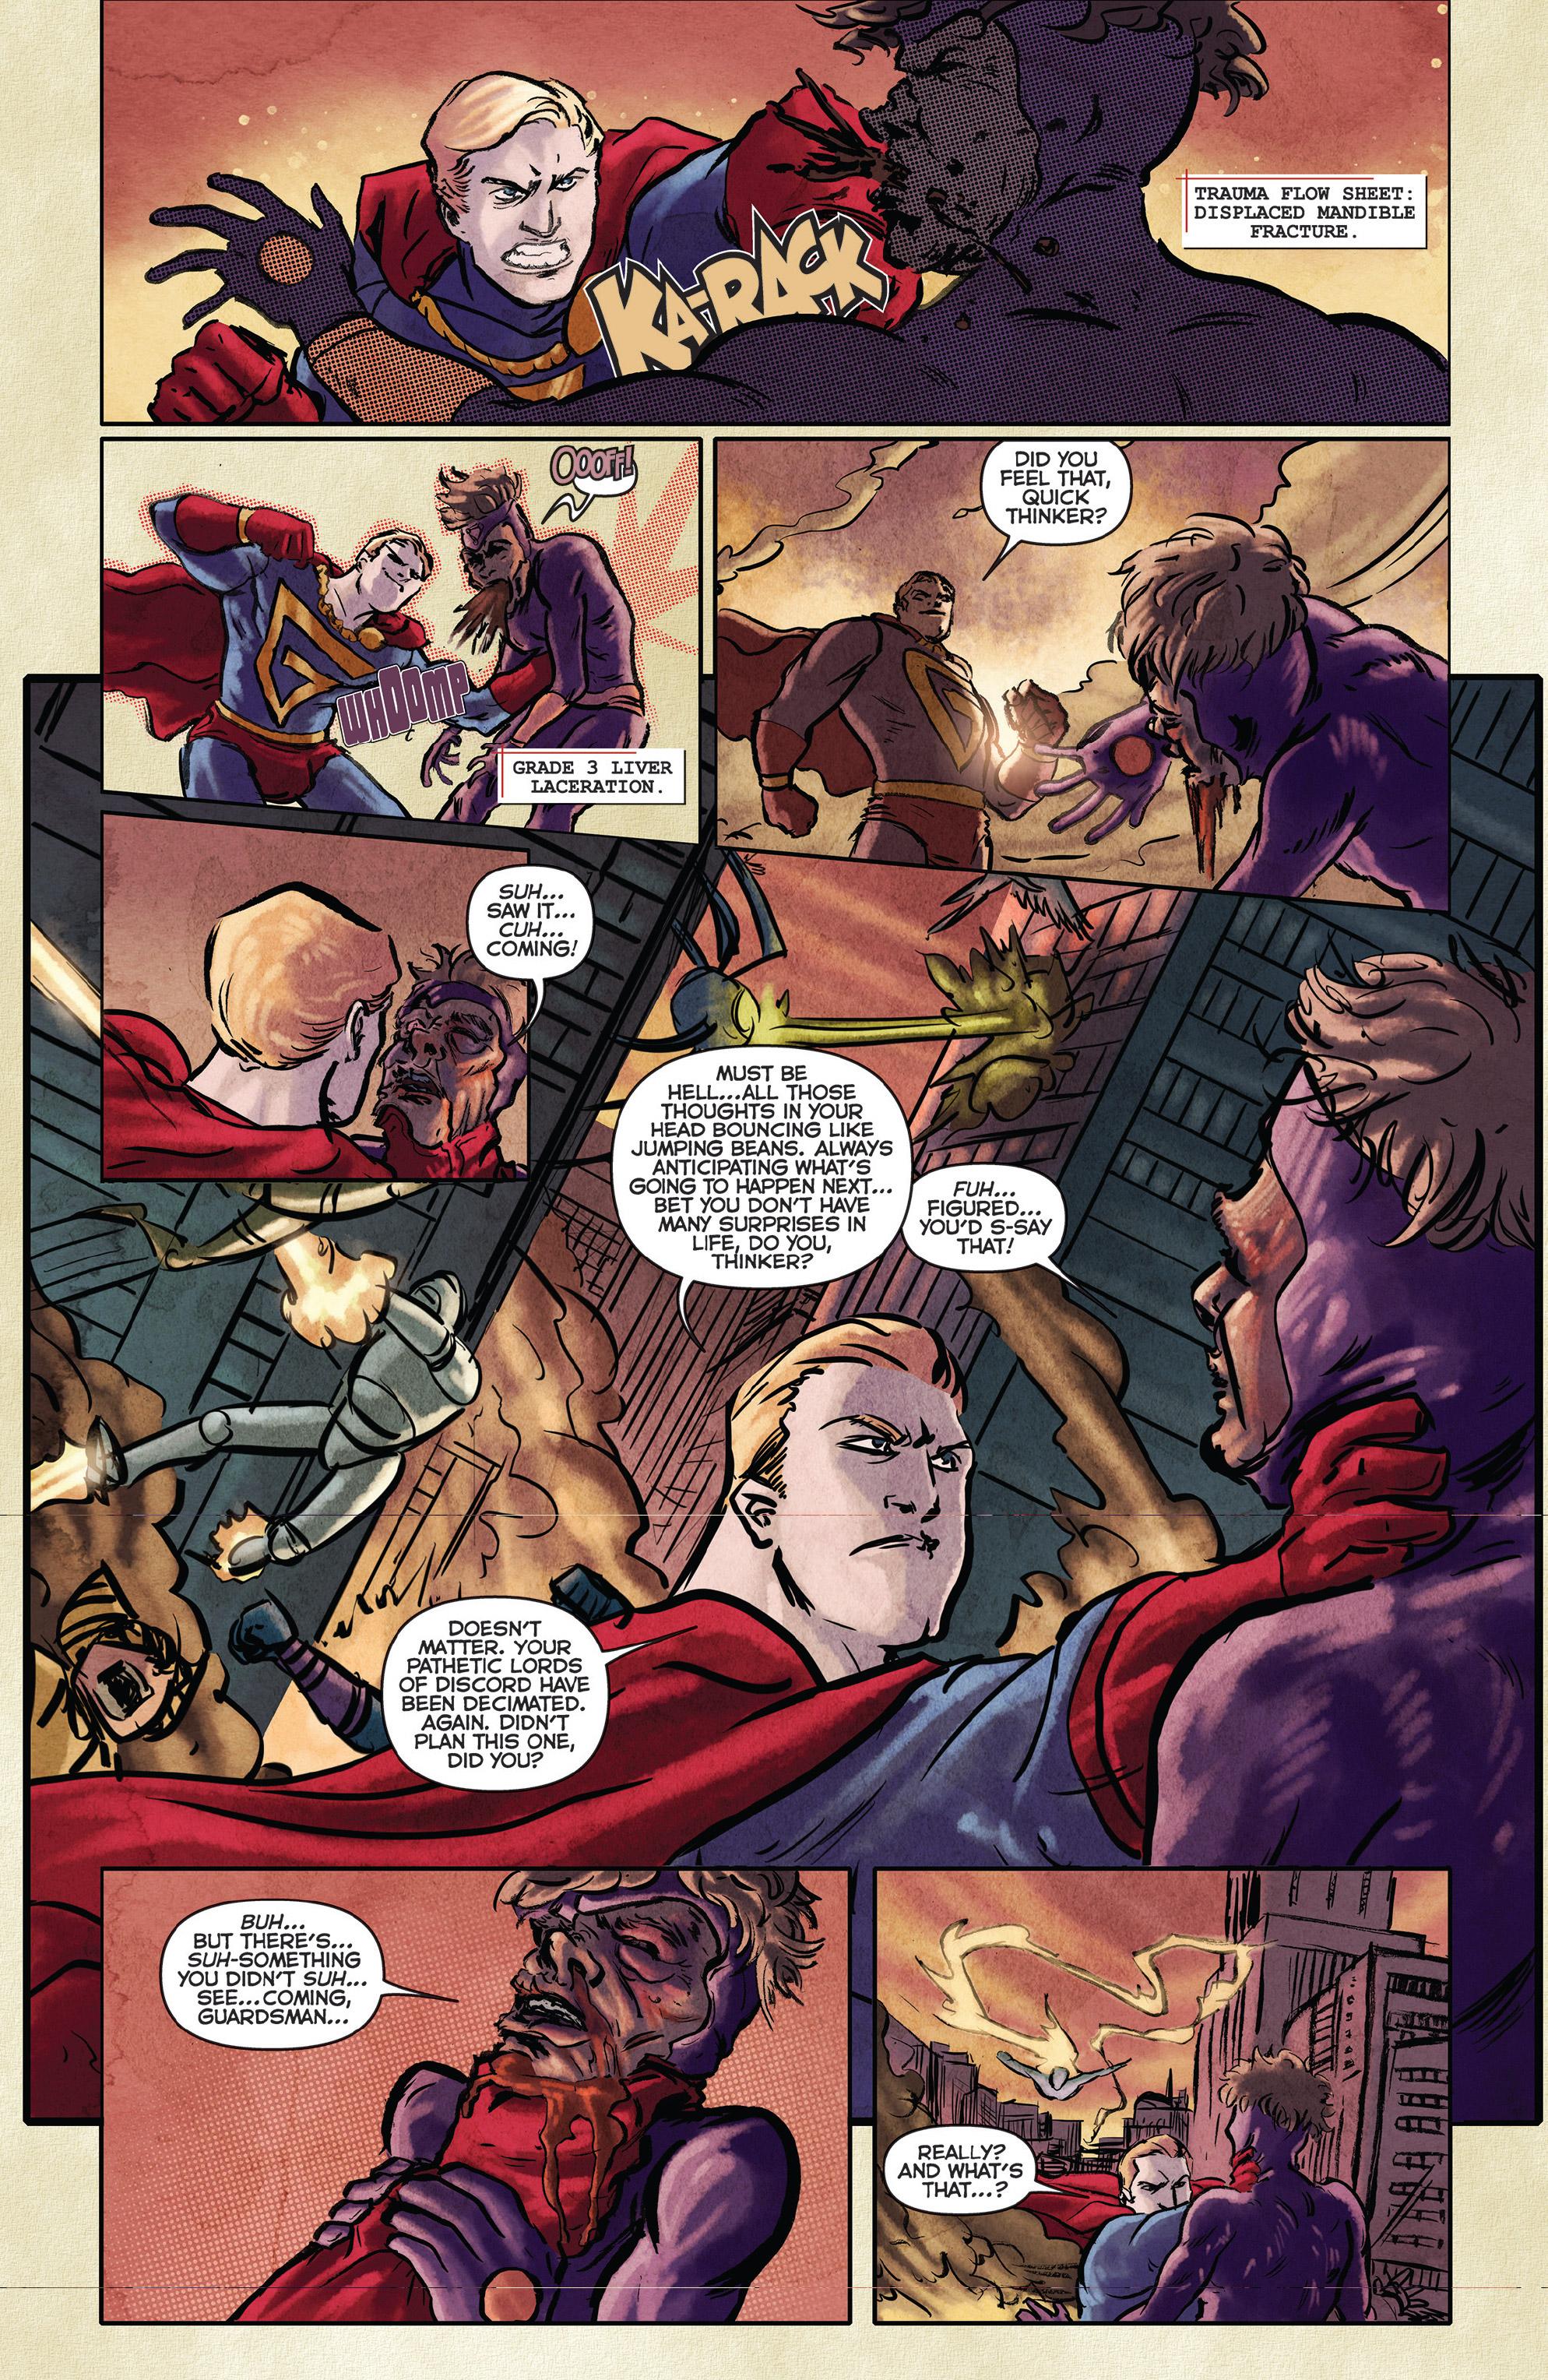 Read online Medisin comic -  Issue #1 - 4